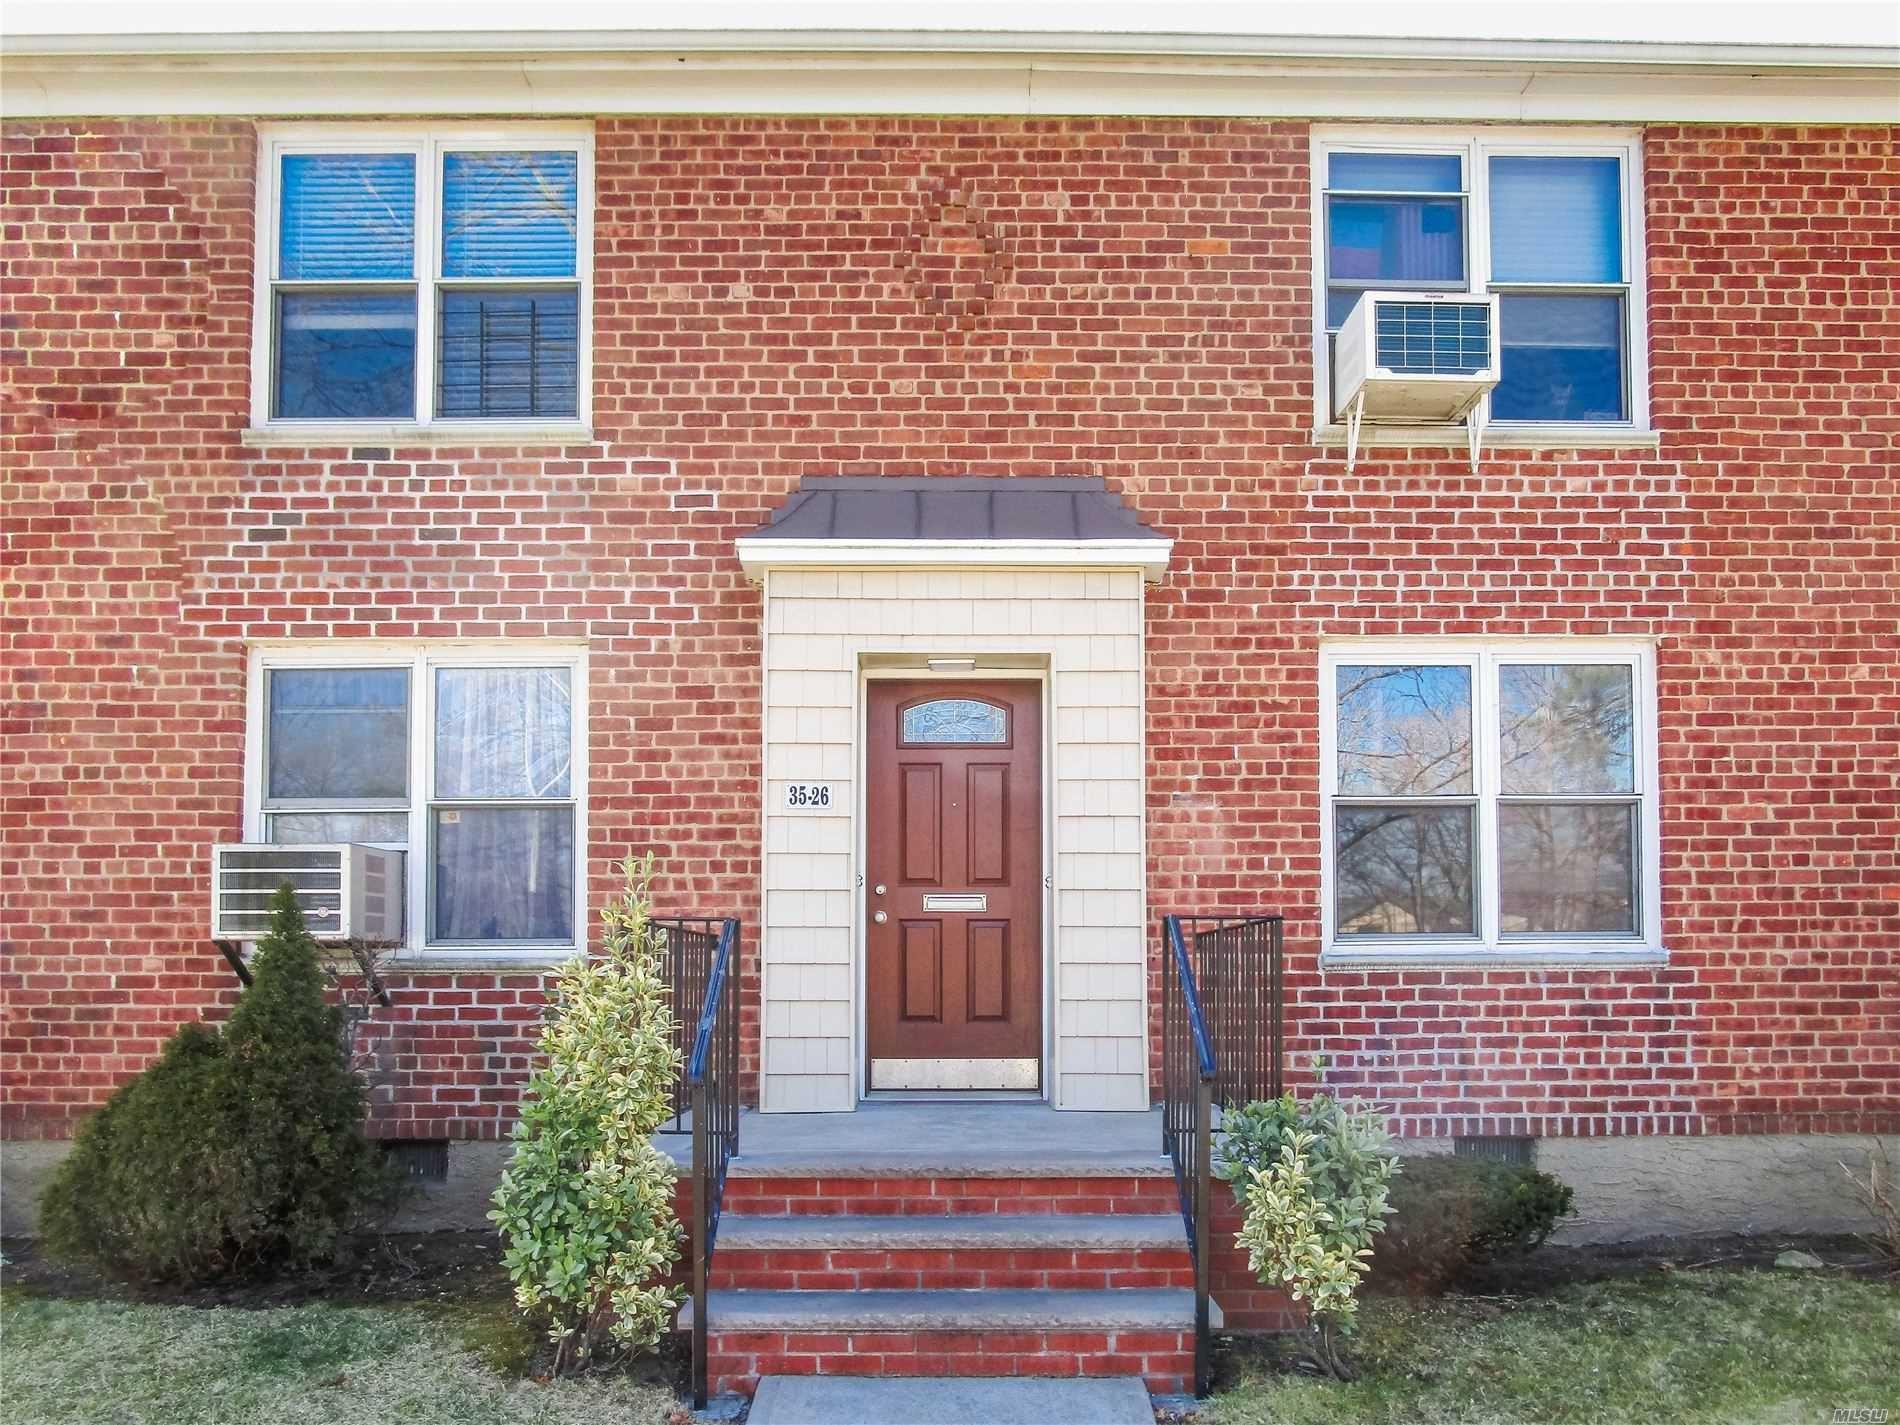 35-26 206th Street #Upper, Bayside, NY 11361 - MLS#: 3204315